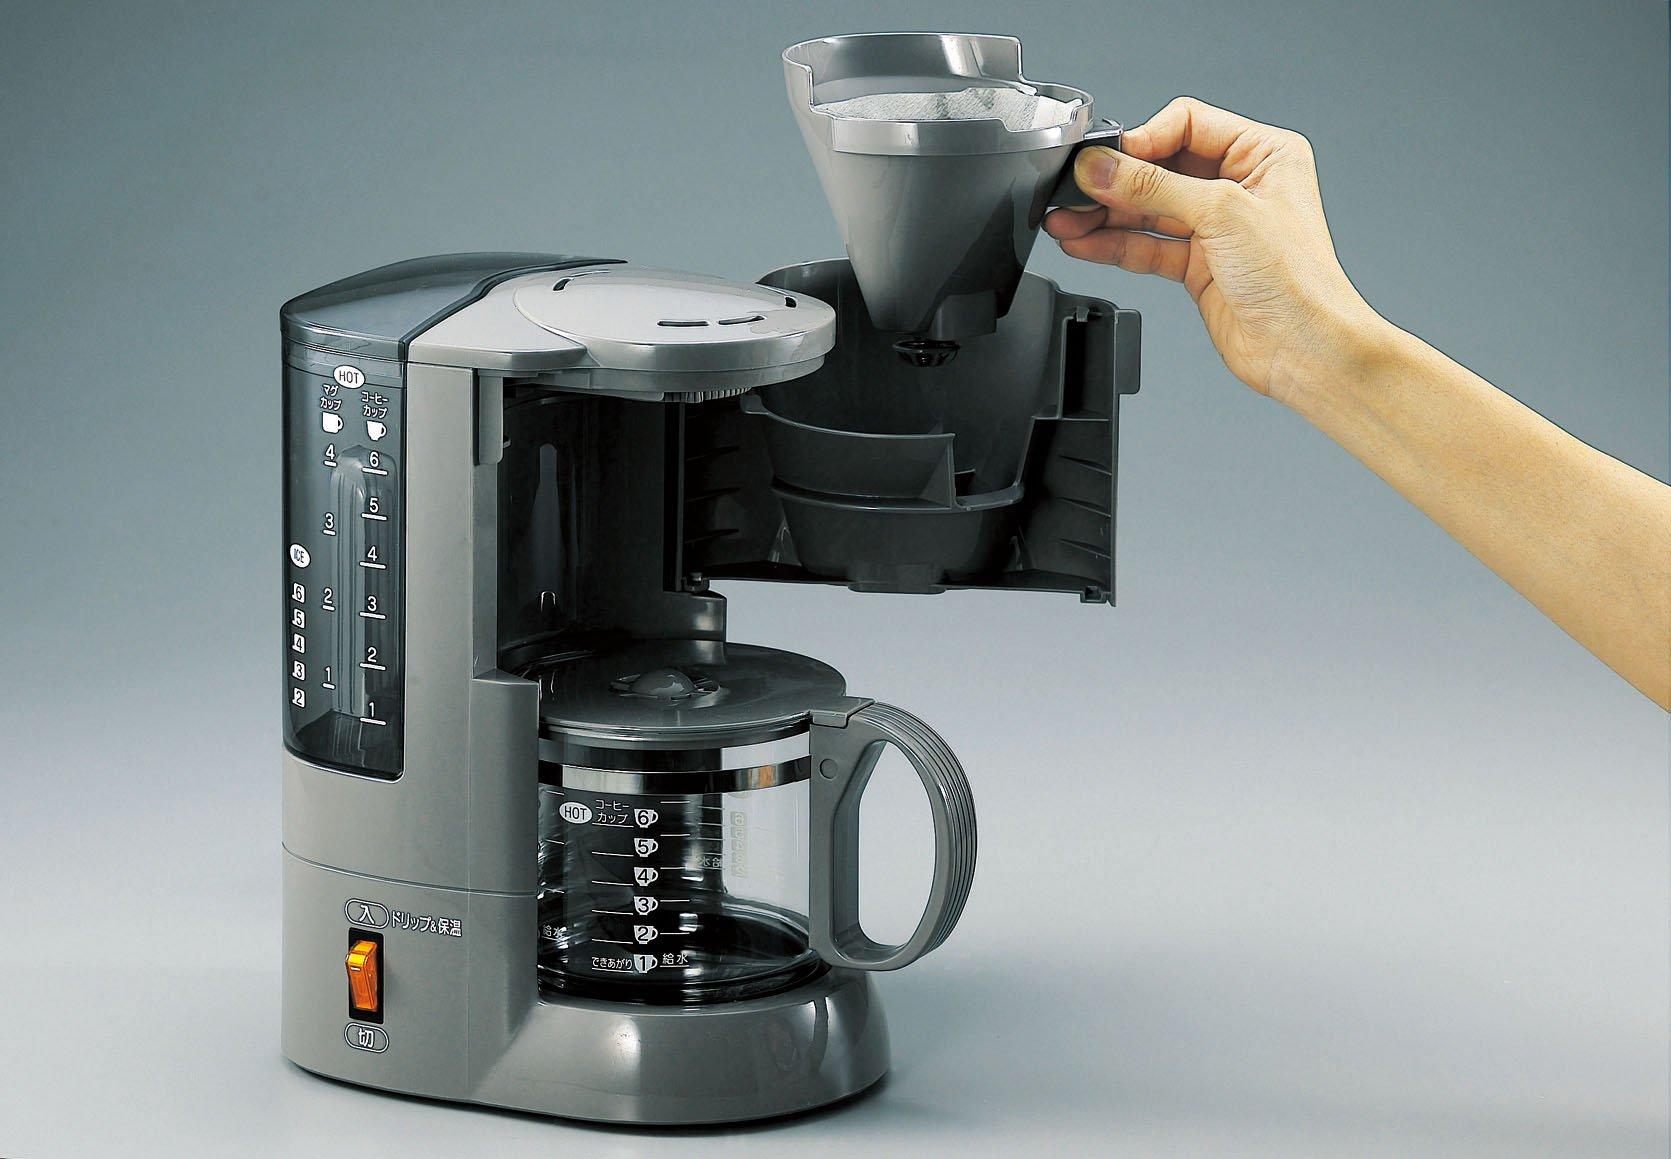 ZOJIRUSHI coffee maker coffee experts EC-AA60-Ta Brown by Unknown by Zojirushi